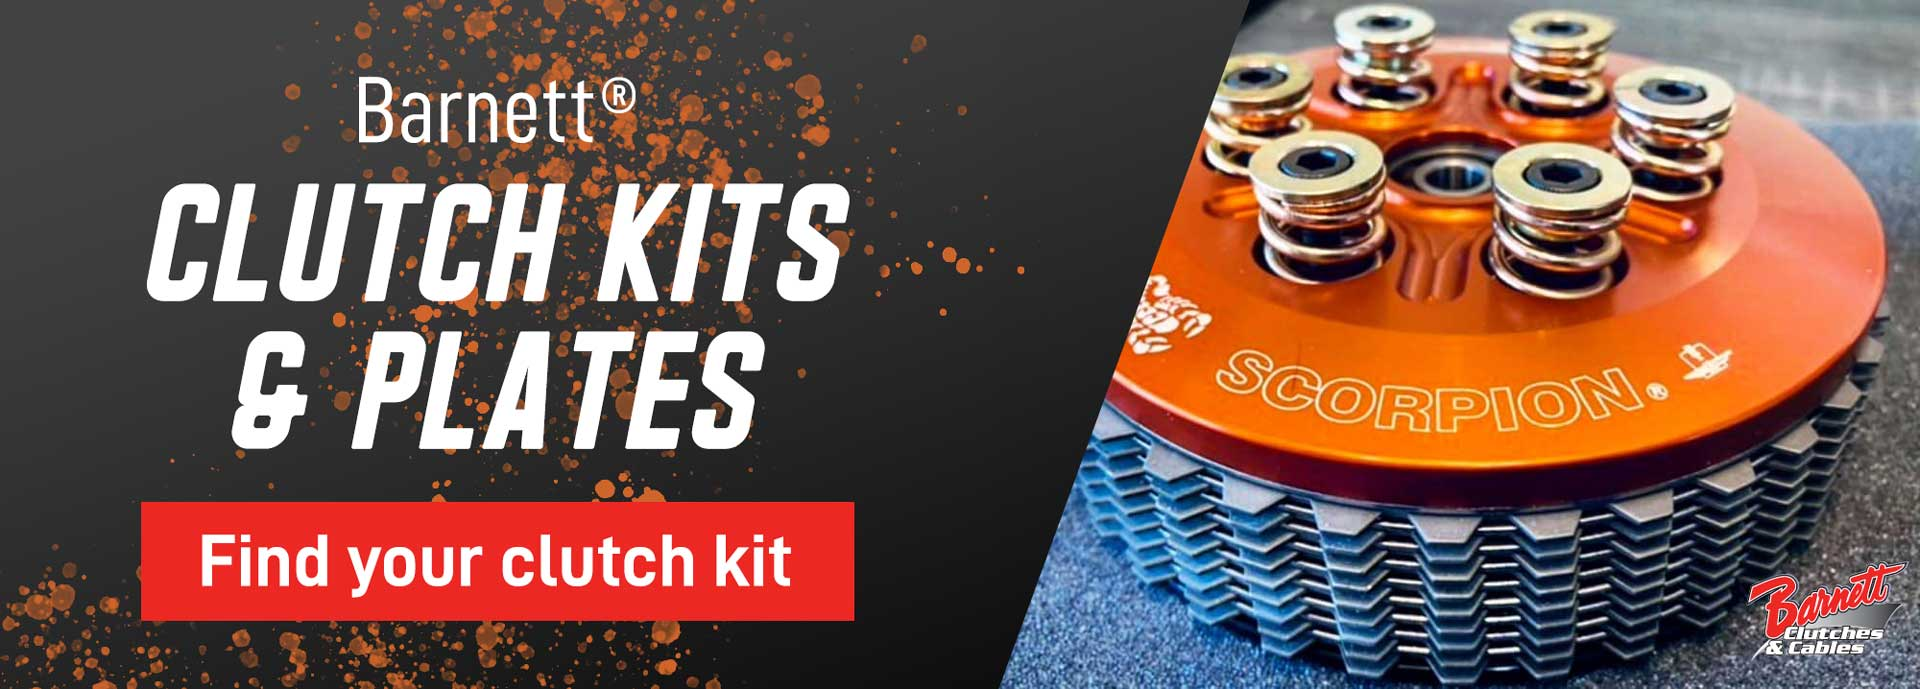 billet-proof-ad-barnett-clutch-kits-4.jpg